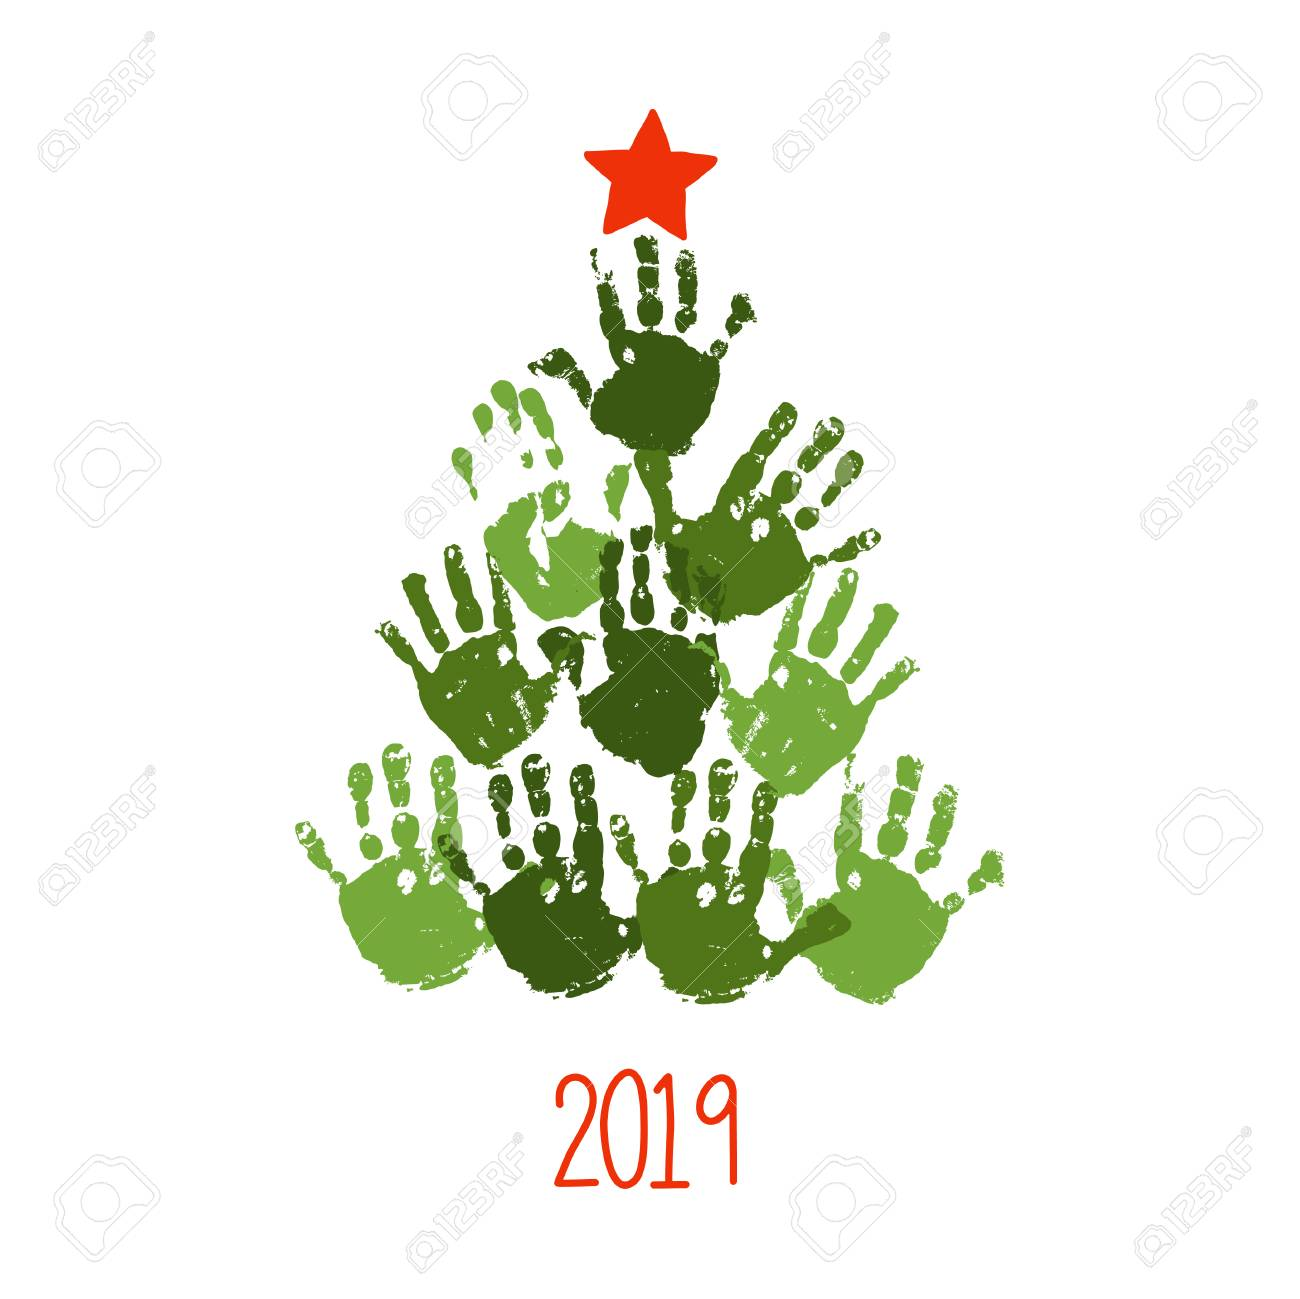 Christmas Tree Cards Designs.Handprint Christmas Tree With Hand Drawn Star Christmas Card